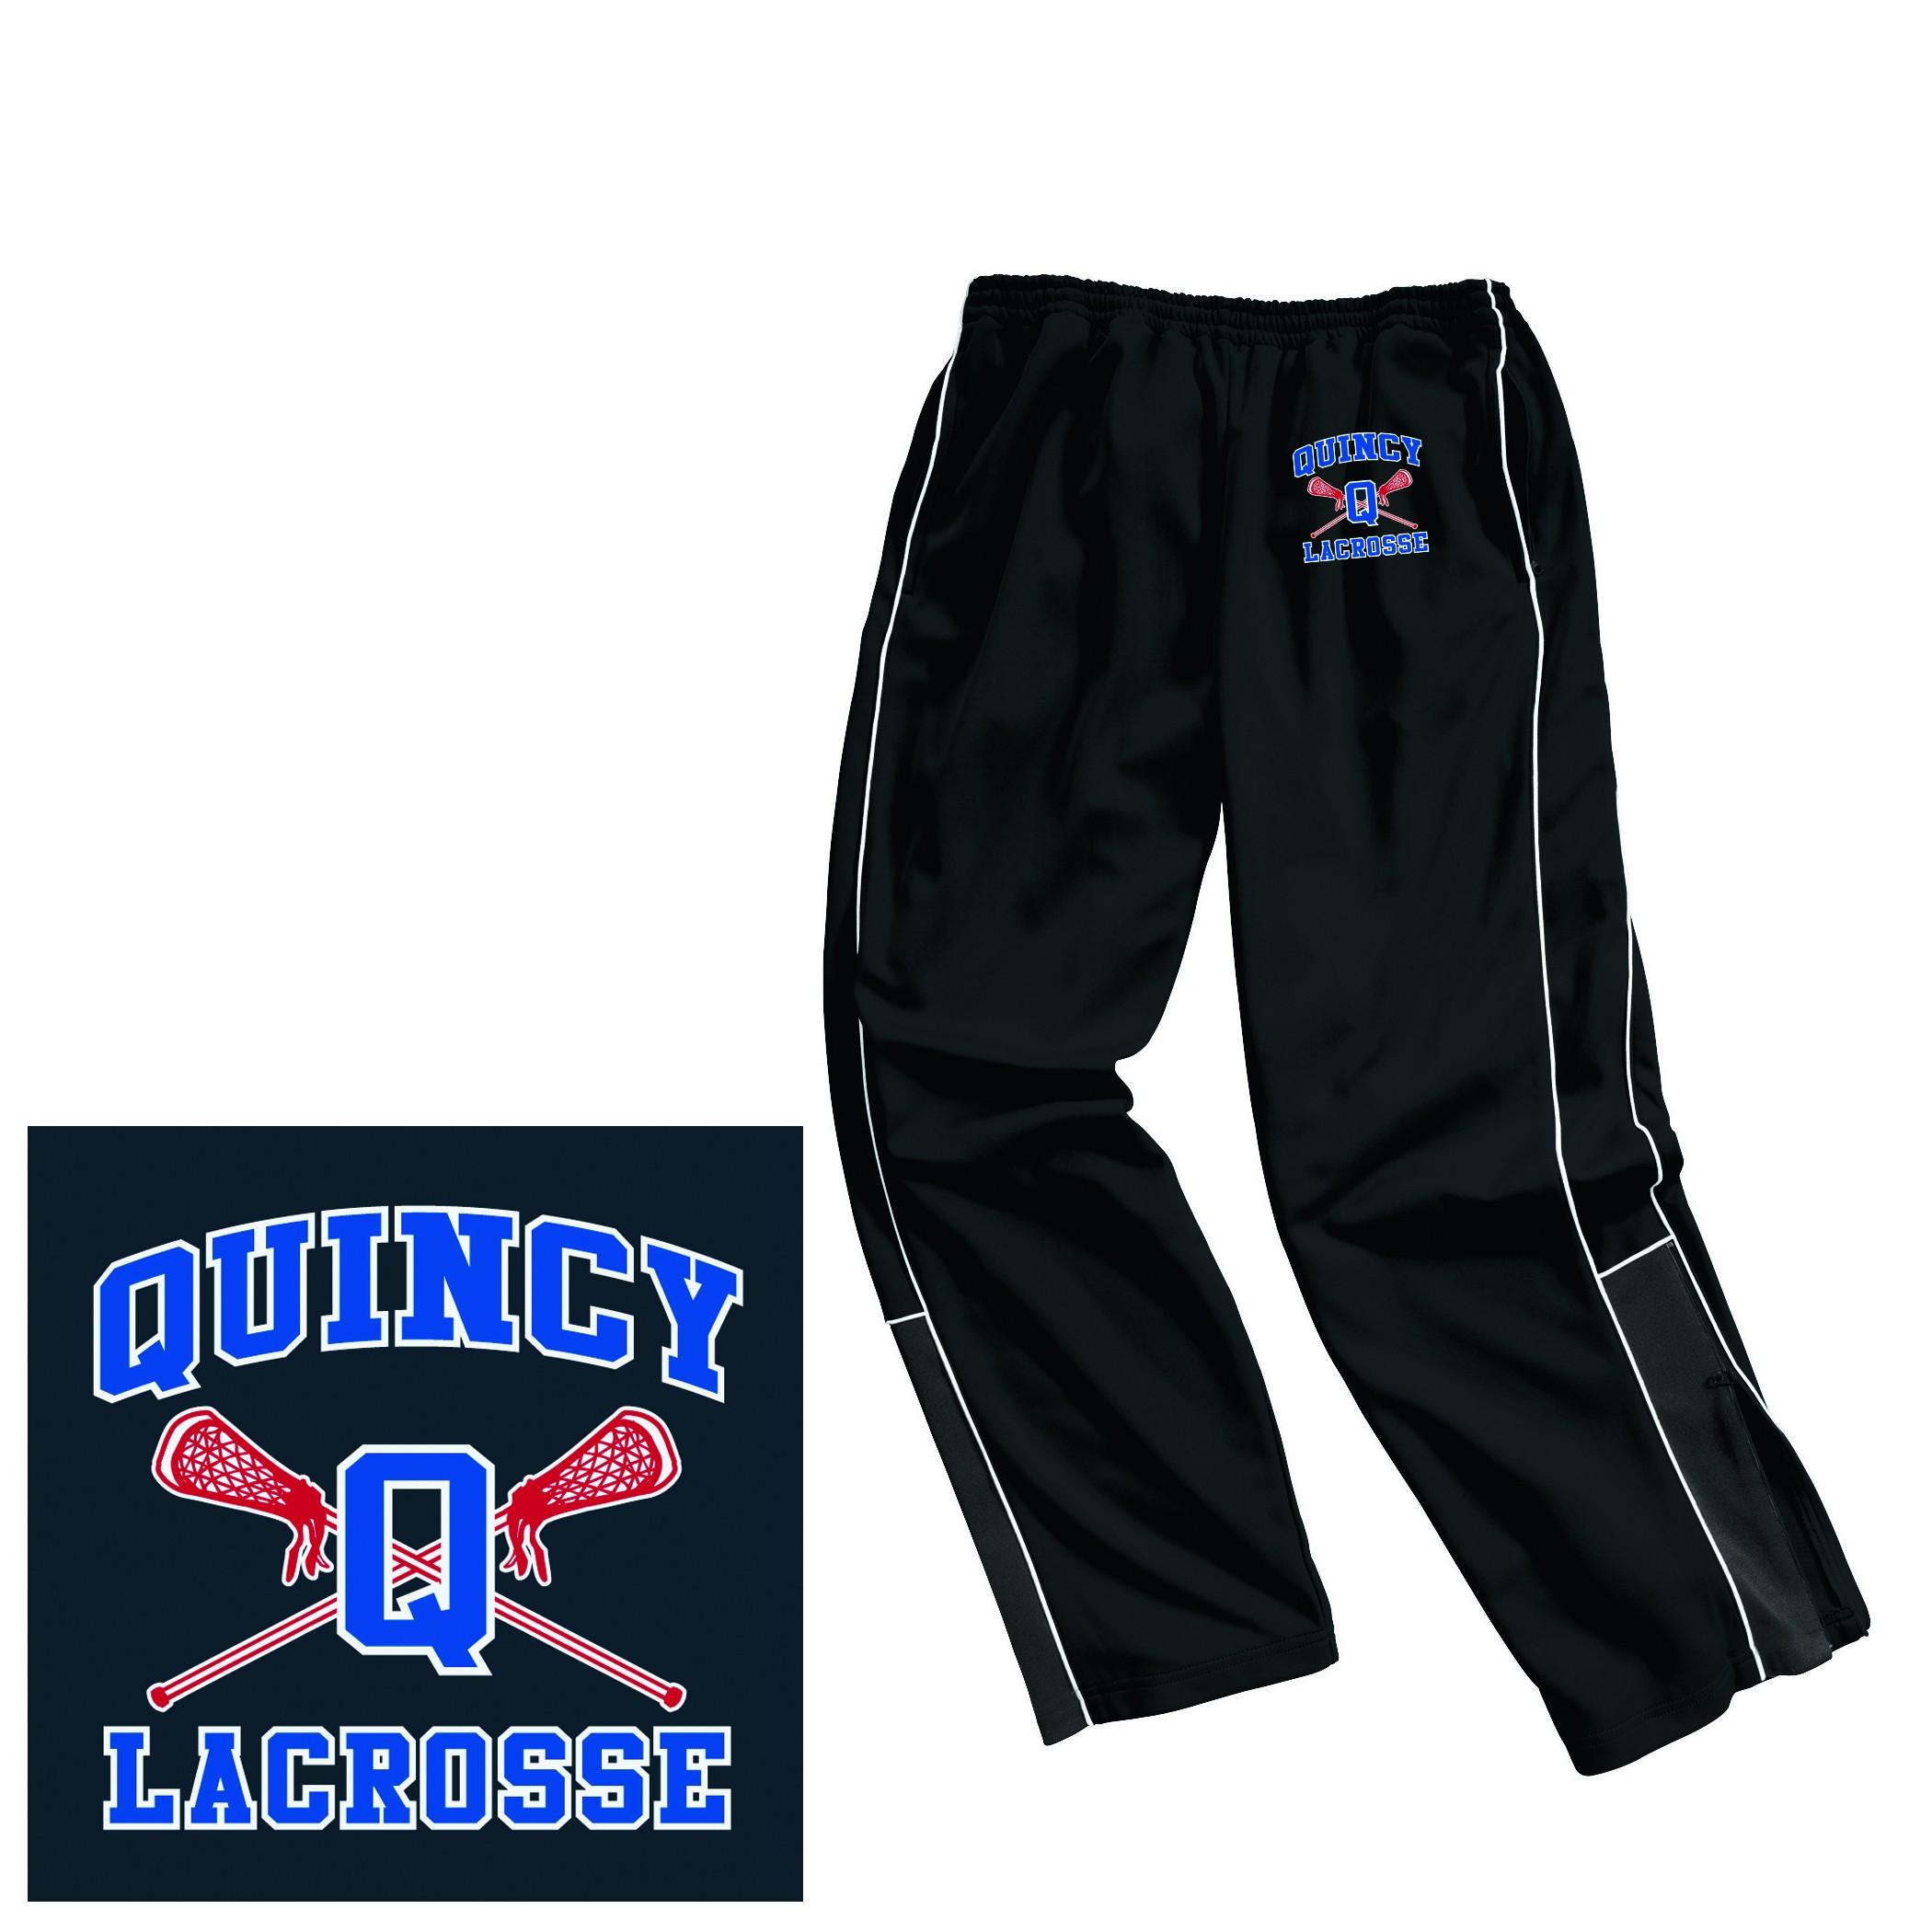 Quincy Lacrosse Chartles River Men's Olympian Pant 9985